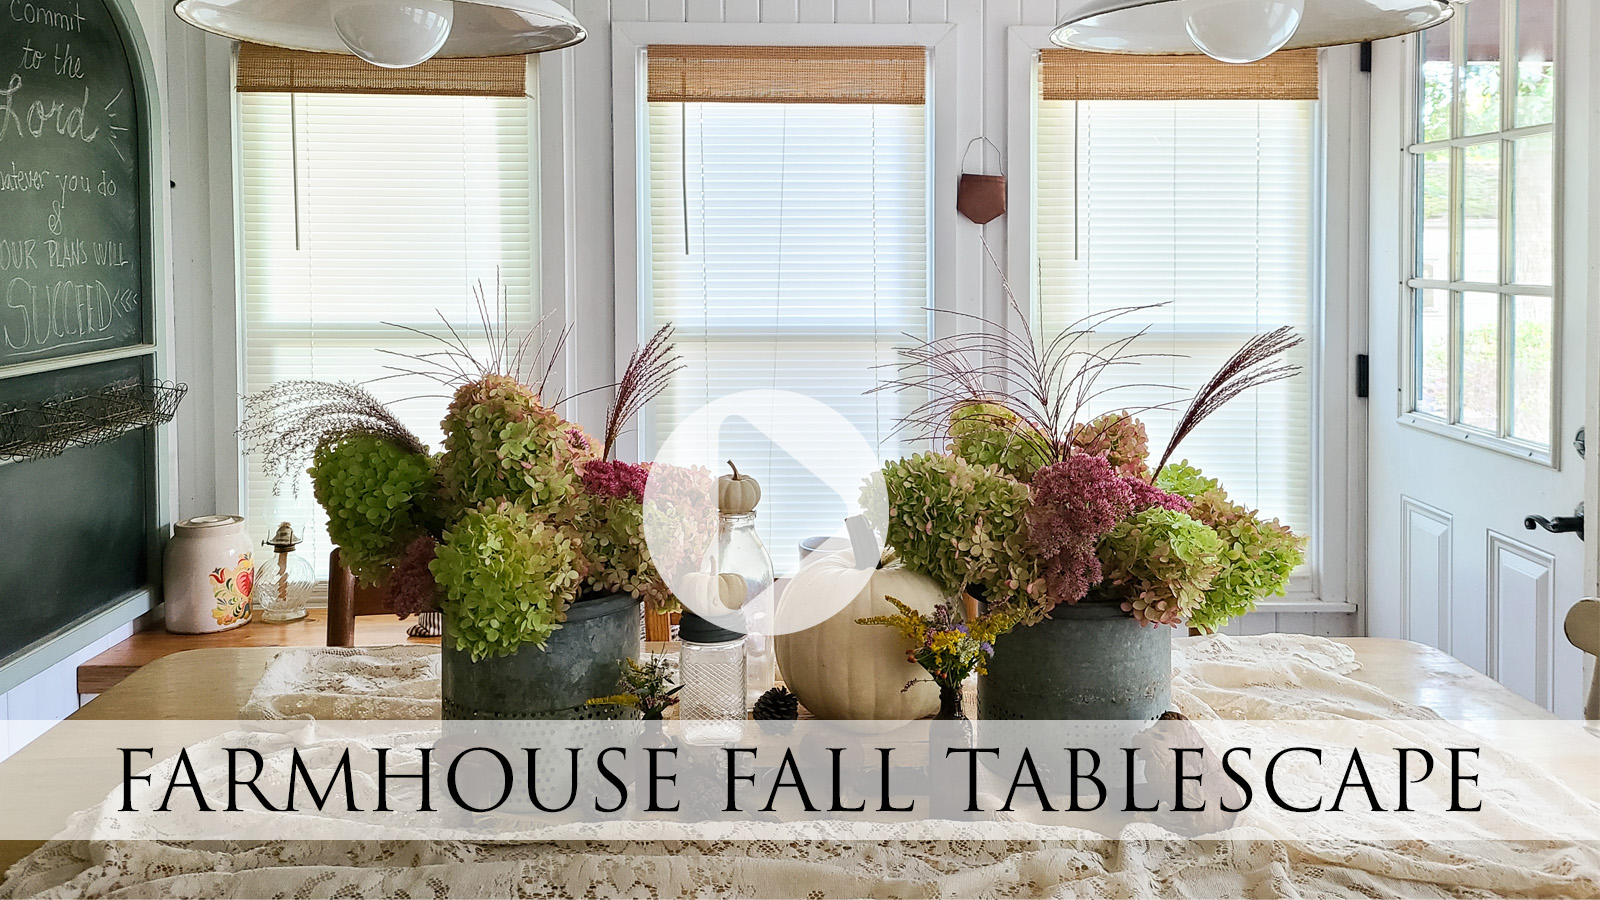 DIY Video Tutorial for a Farmhouse Fall Tablescape by Larissa of Prodigal Pieces | prodigalpieces.com #prodigalpieces